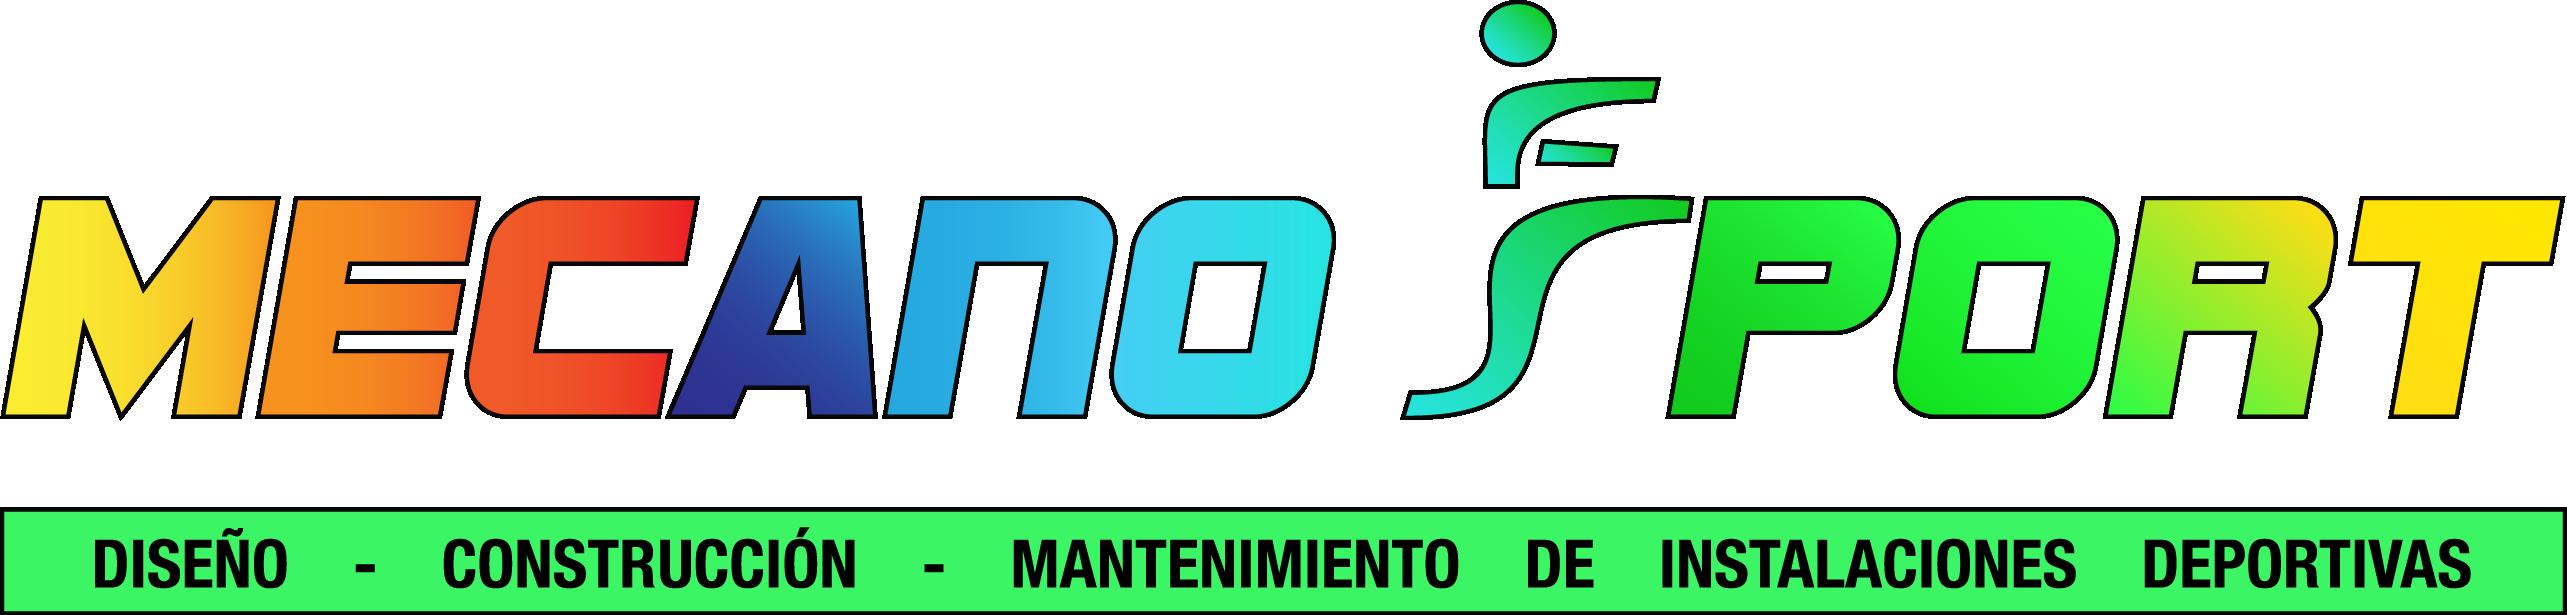 Mecano Sport, S. L.